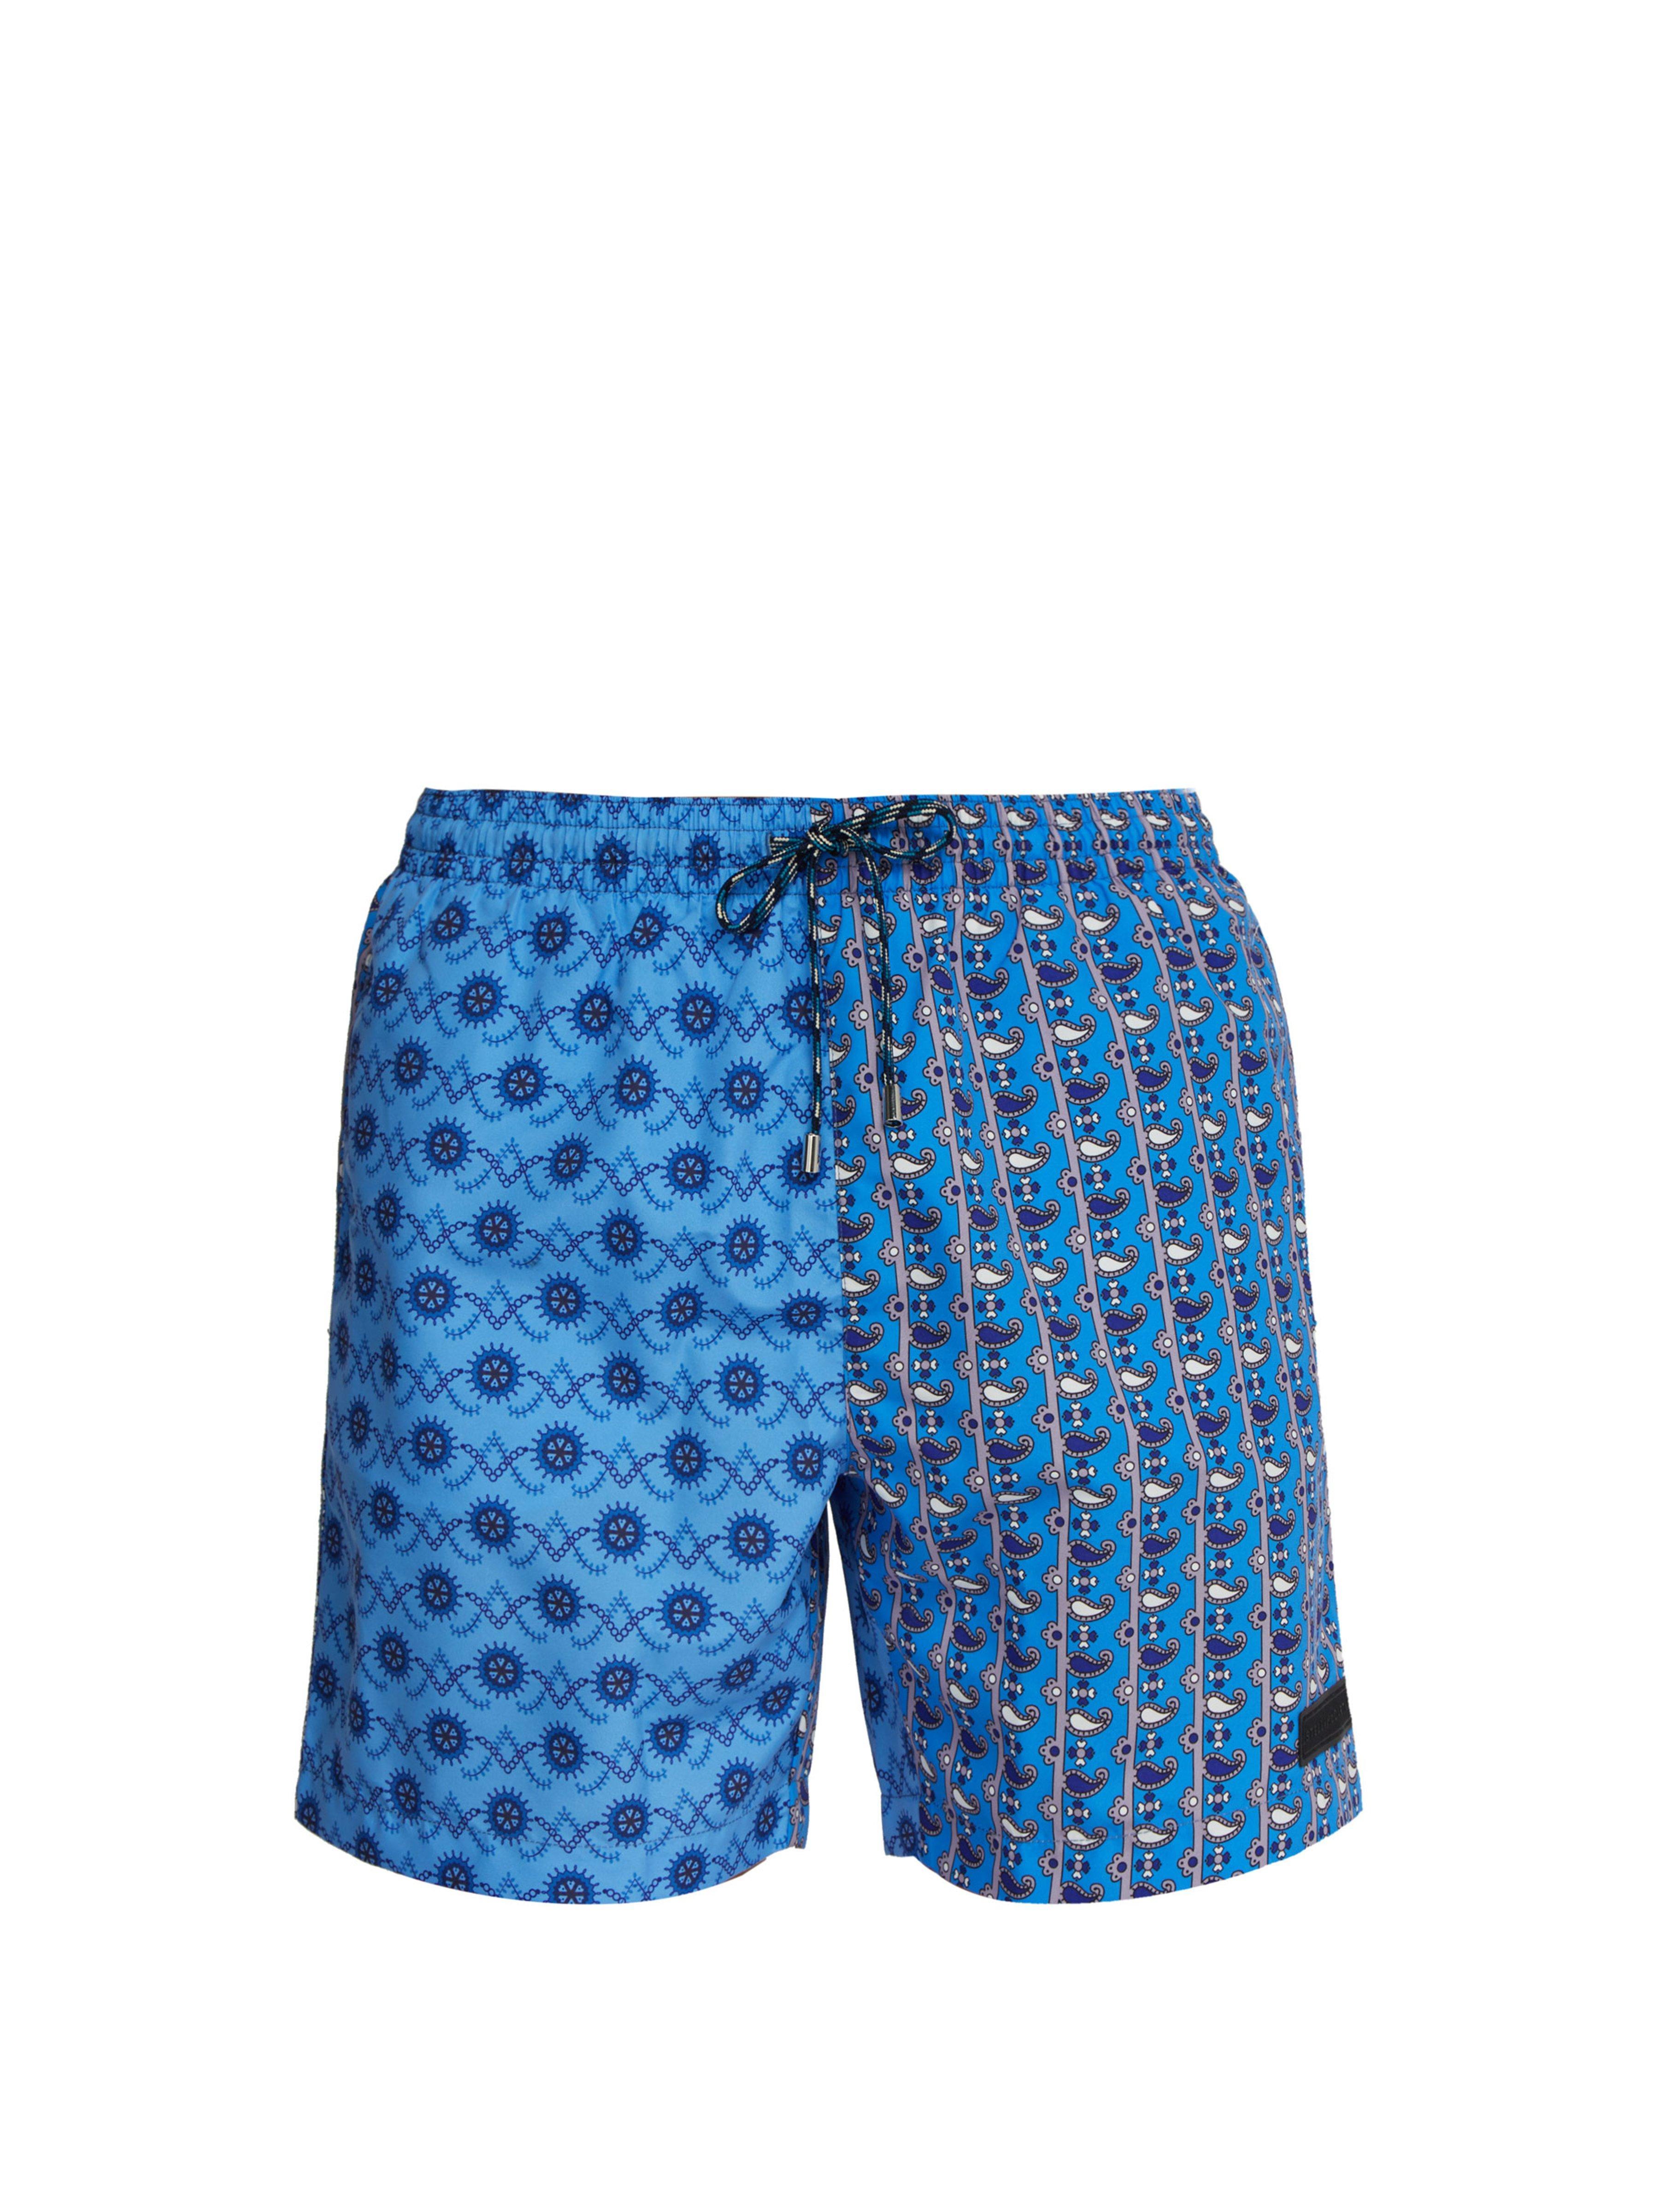 0c665c6ebc Stella McCartney Nautical And Paisley Print Swim Shorts in Blue for ...